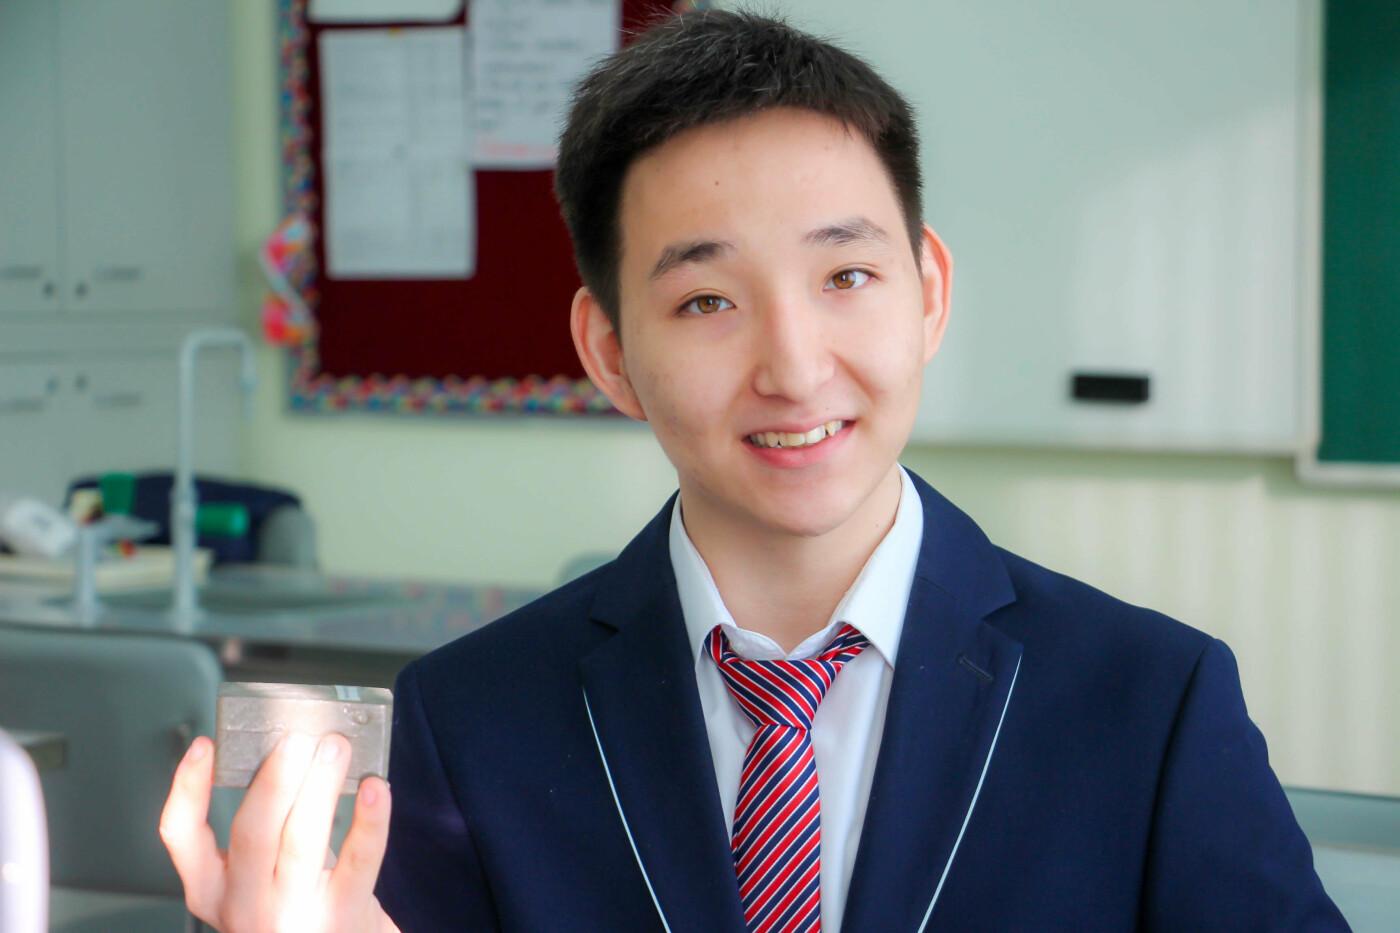 В Атырау старшеклассник изобрёл кирпич из пластика (фото), фото-2